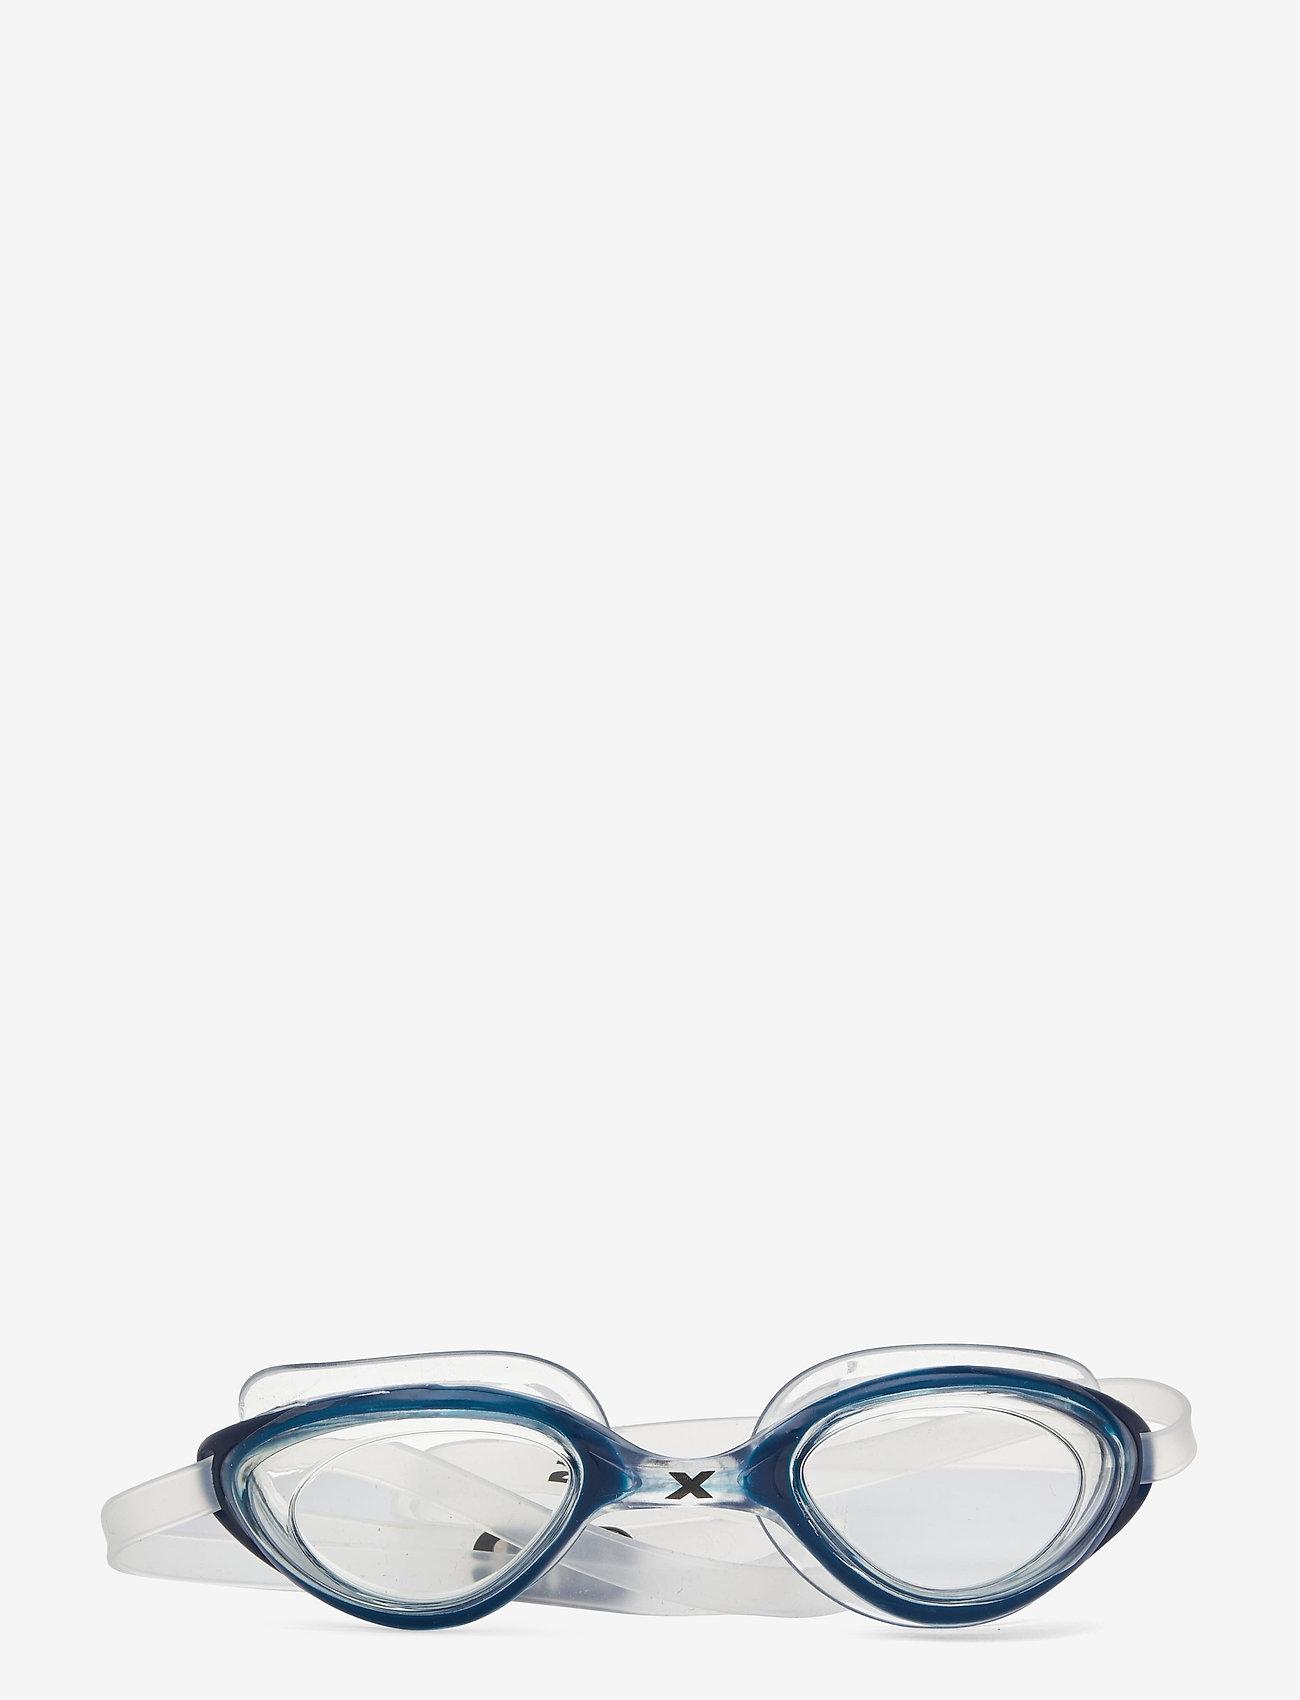 2XU - RIVAL GOGGLE - CLEAR - bril - clear/blue - 0